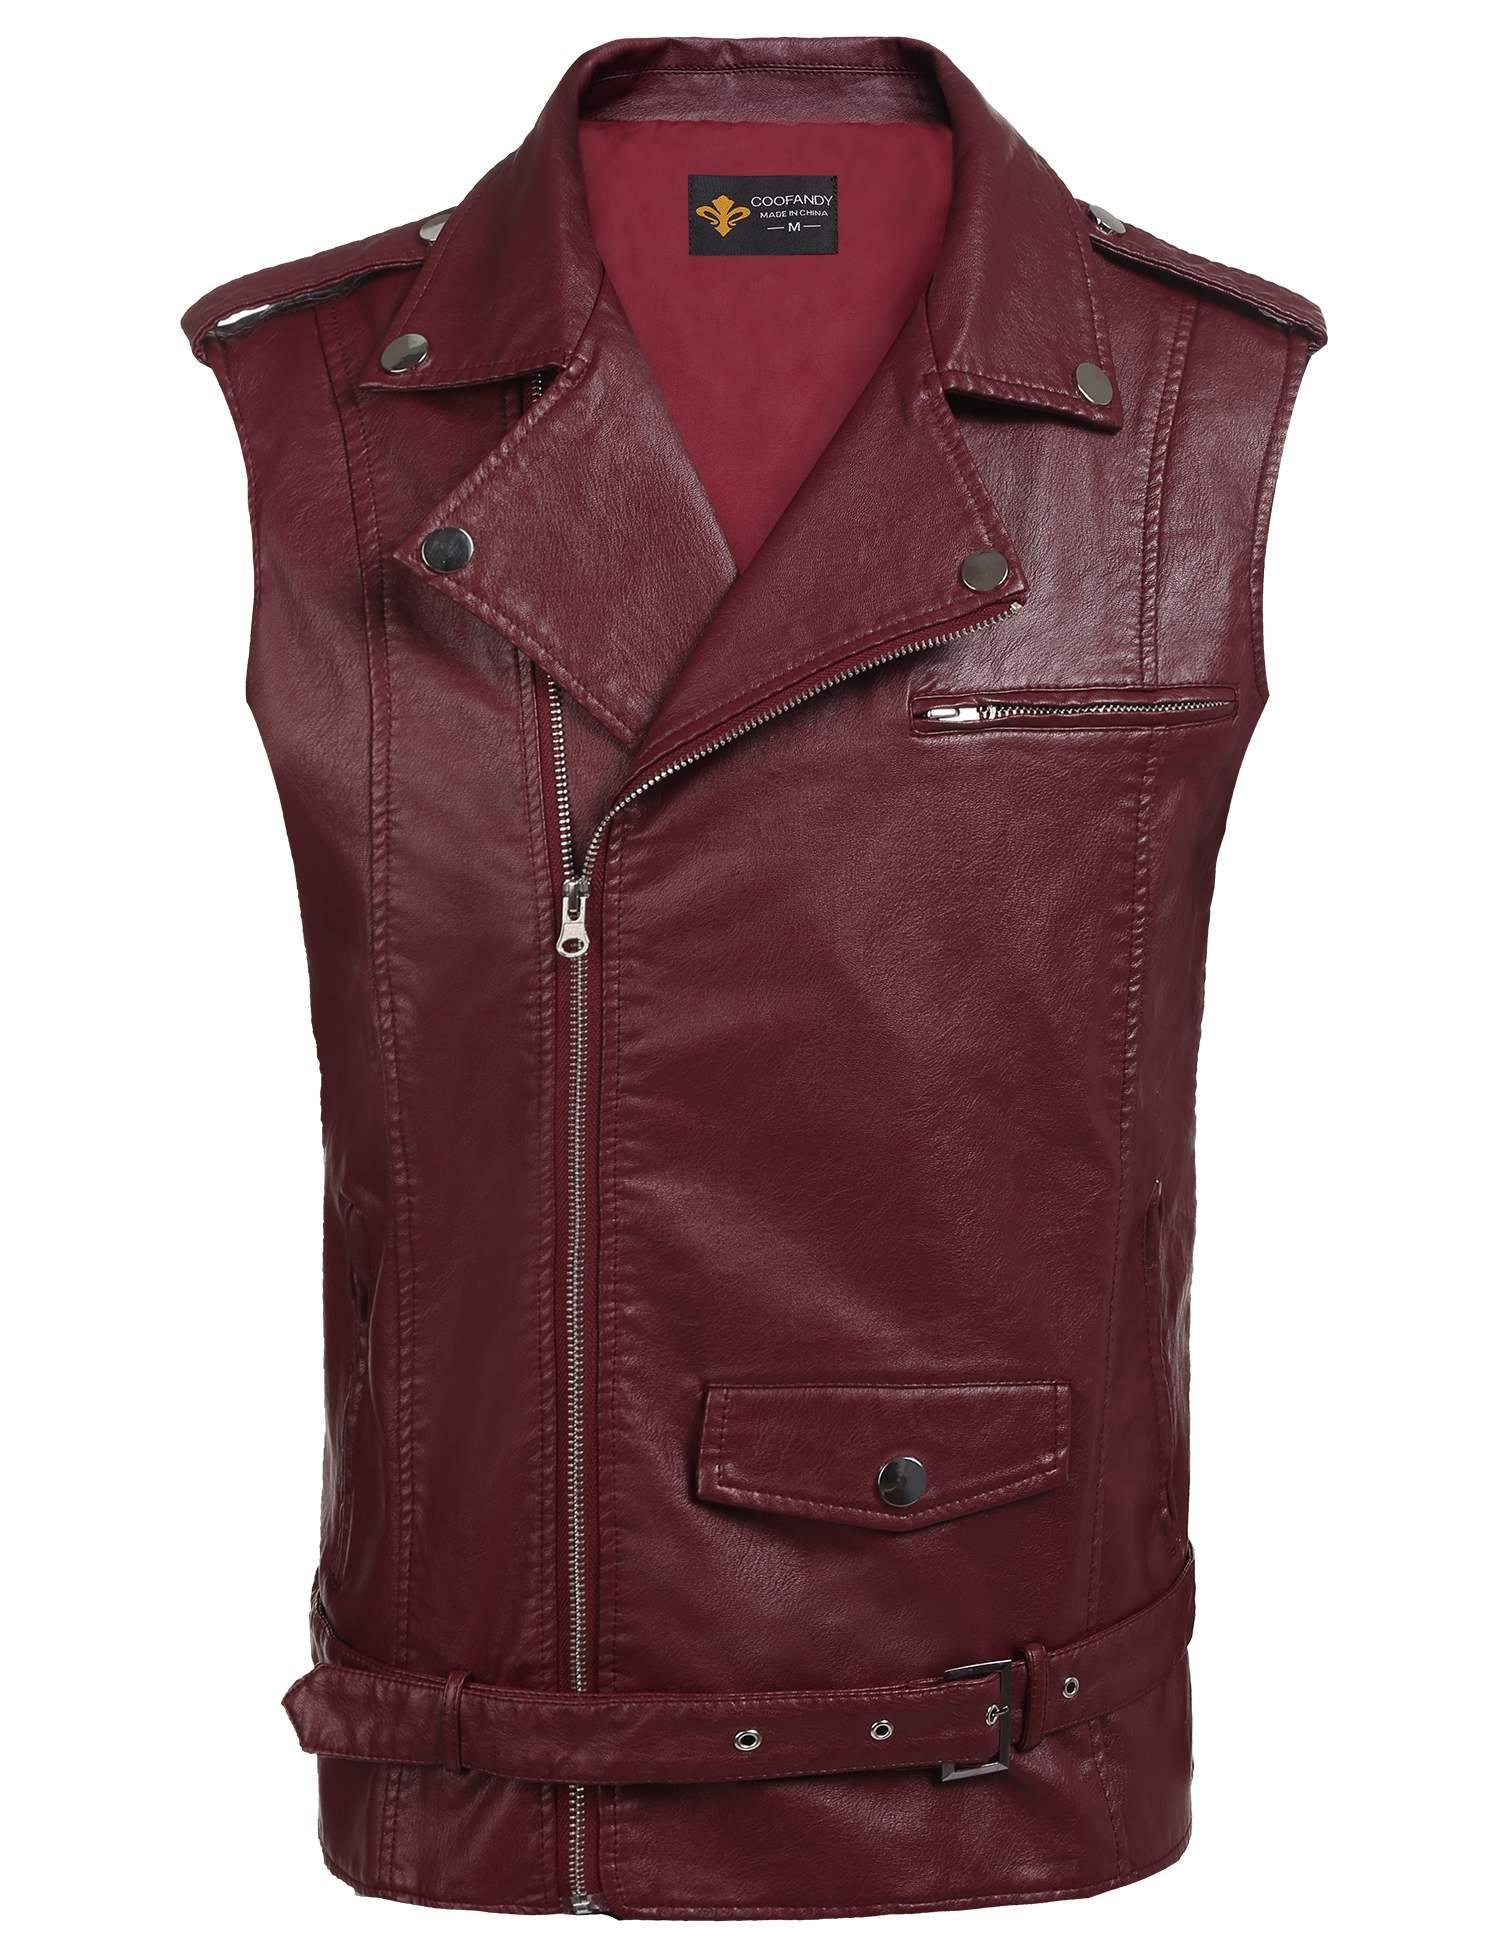 JINIDU Mens Hipster Leather Vest Retro Motorcycle Racer Leather Jacket Vests with Gun Pocket(Wine Red,XL)